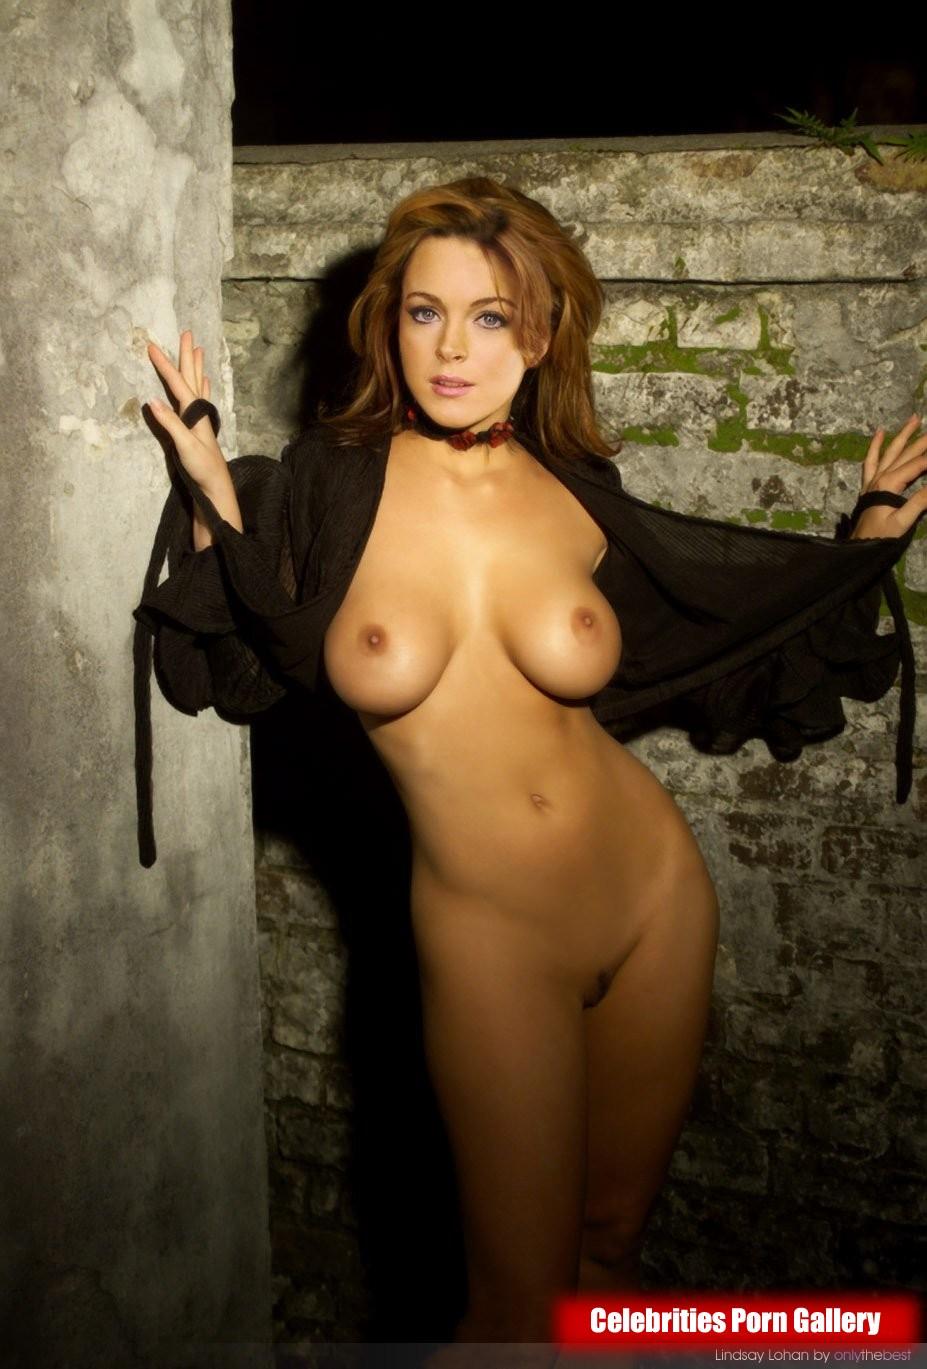 Порно фото знаменитостей ленси лохан